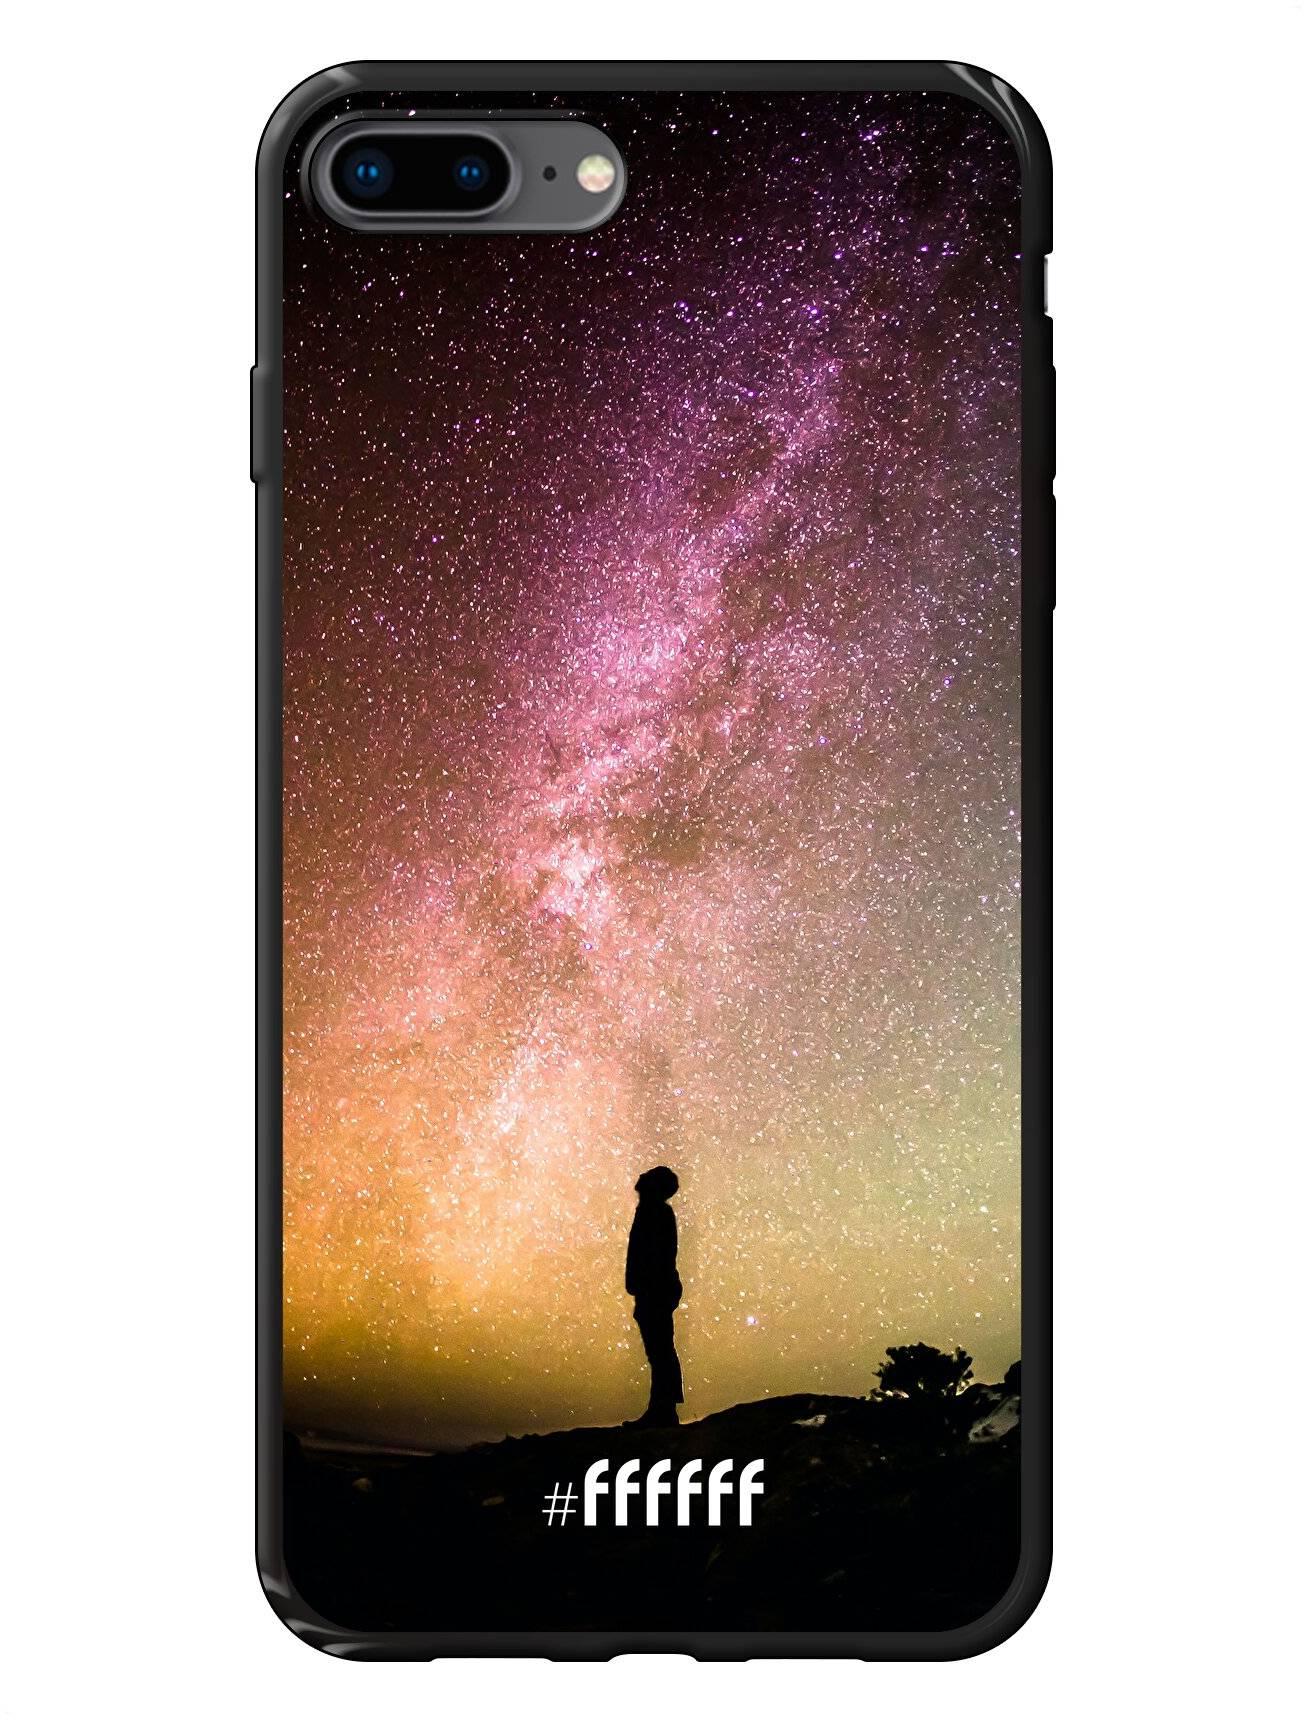 Watching the Stars iPhone 8 Plus